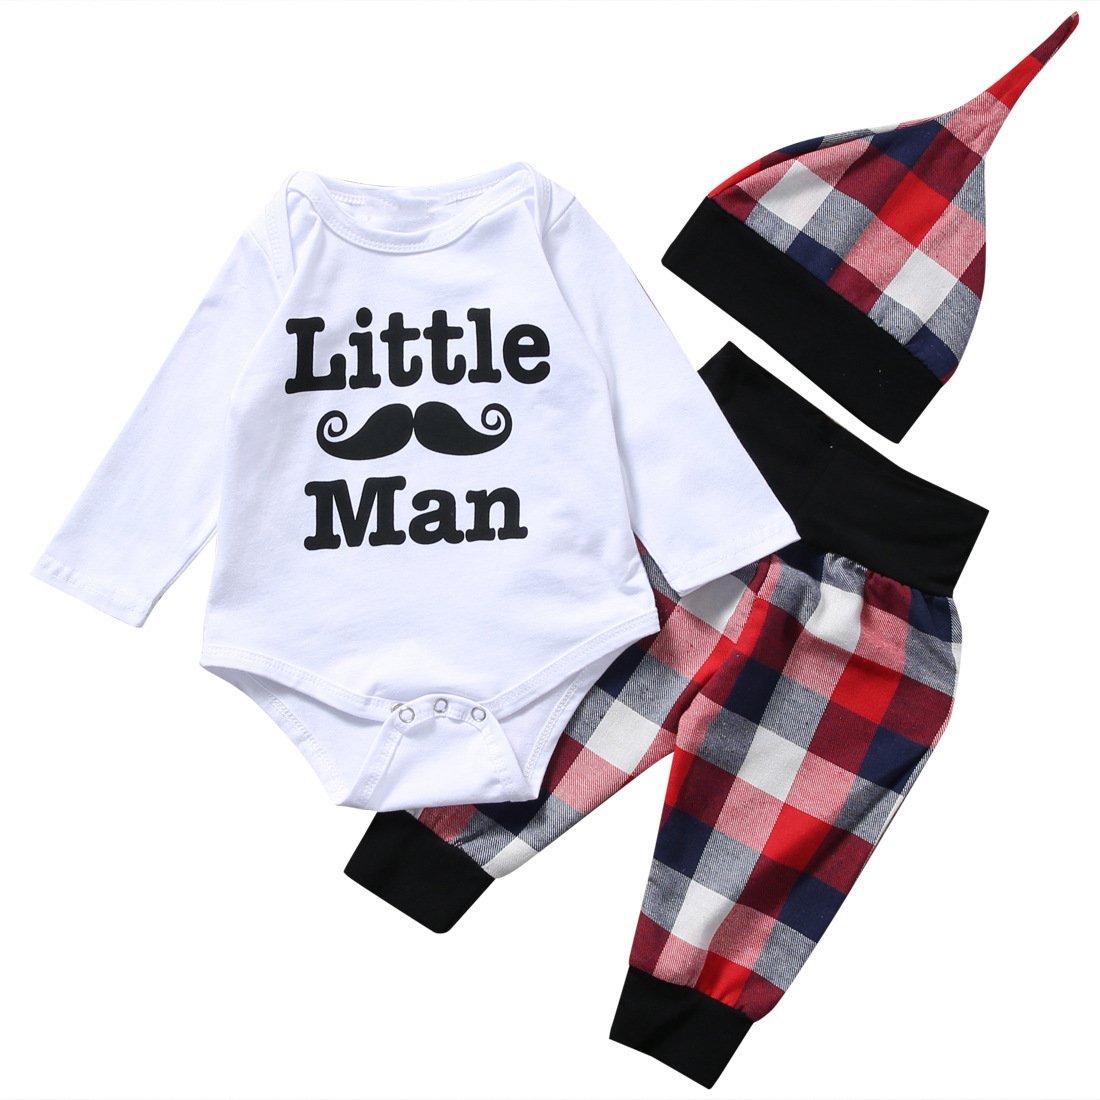 Newborn Baby Boy Girl Clothes Little Man Long Sleeve Romper, Plaid Pants + Cute Hat 3pcs Outfit Set